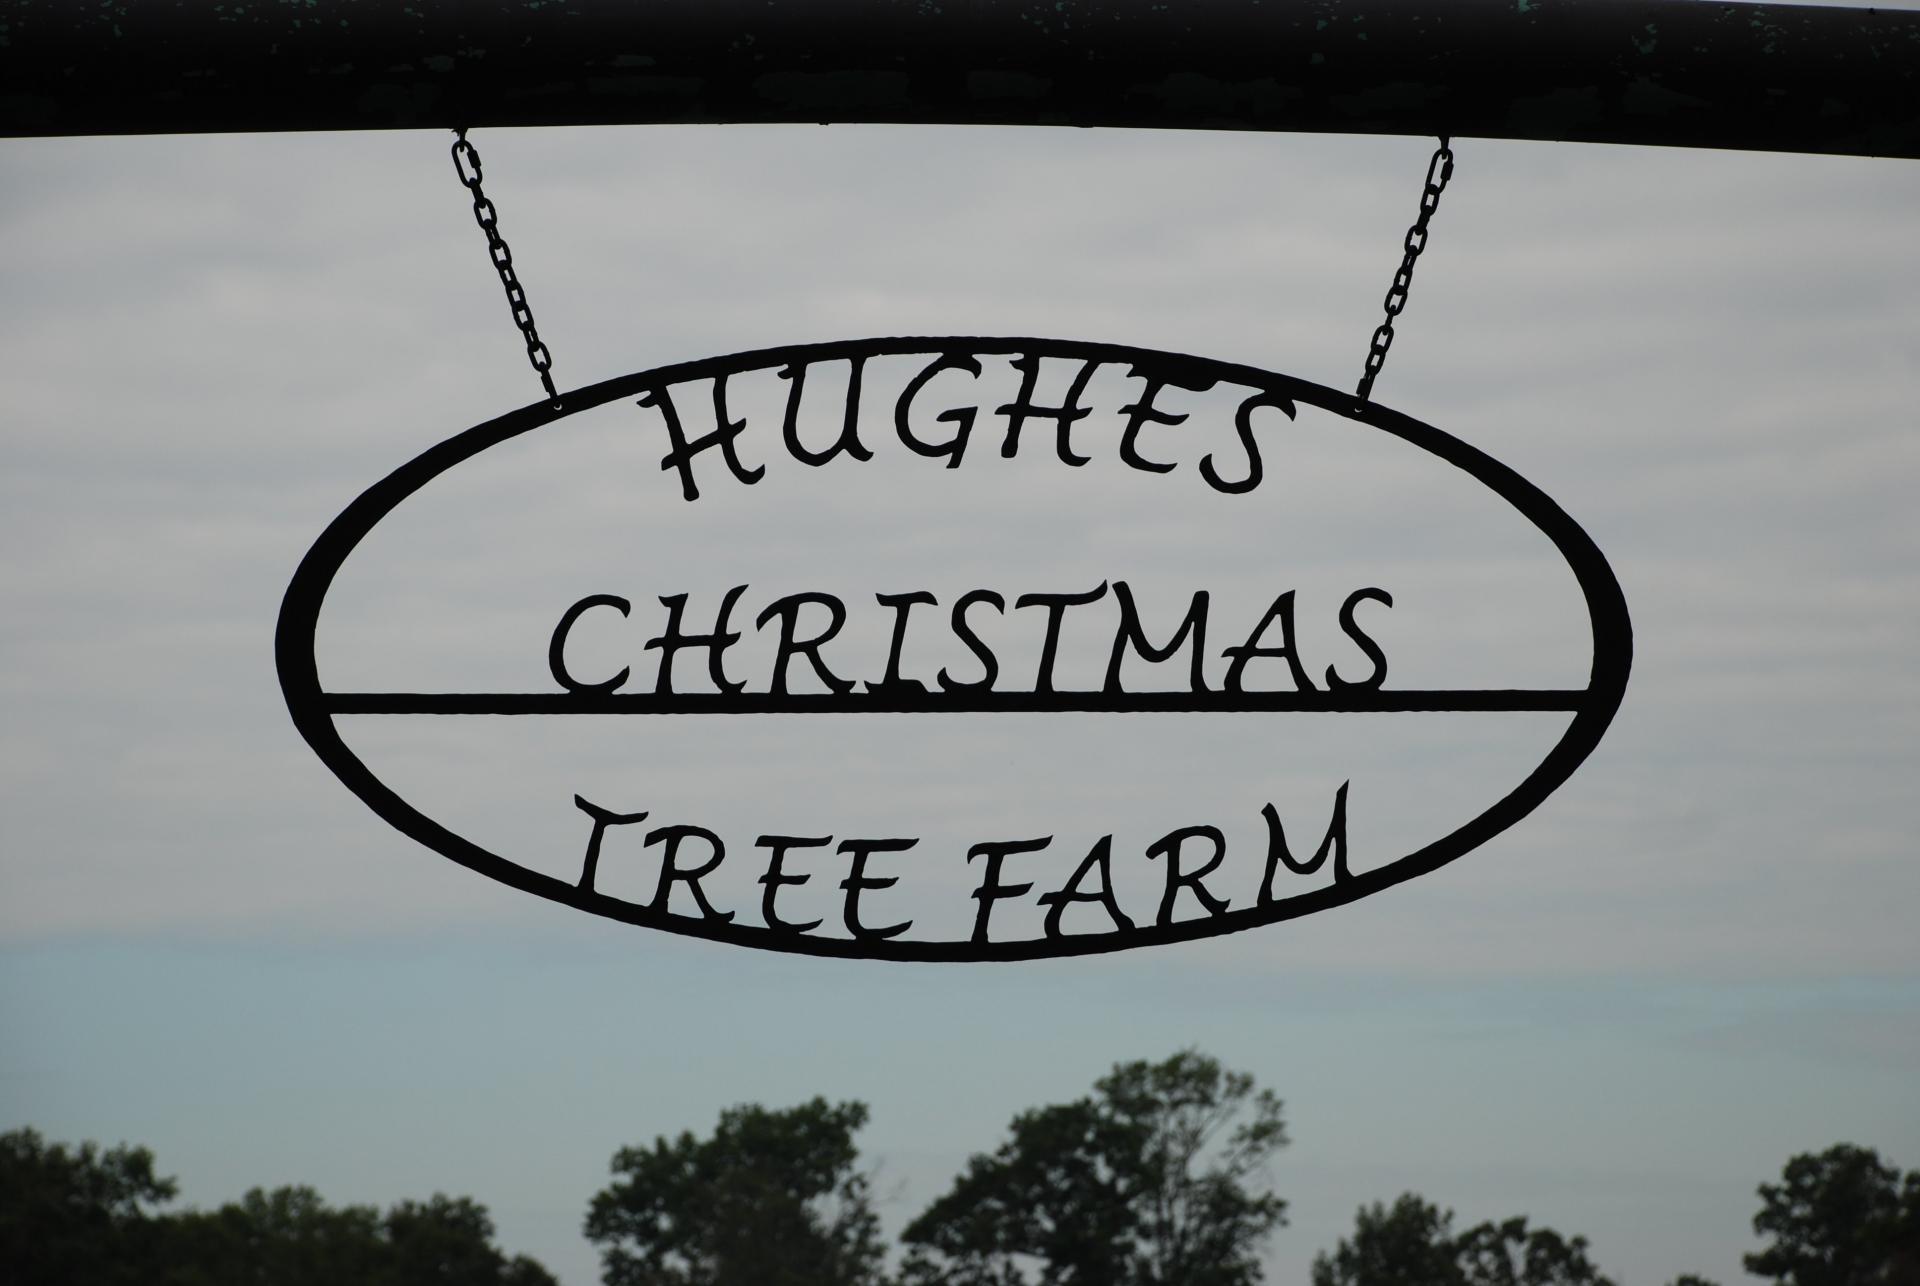 hughes christmas tree farm benton la logo - Christmas Tree Farm Louisiana